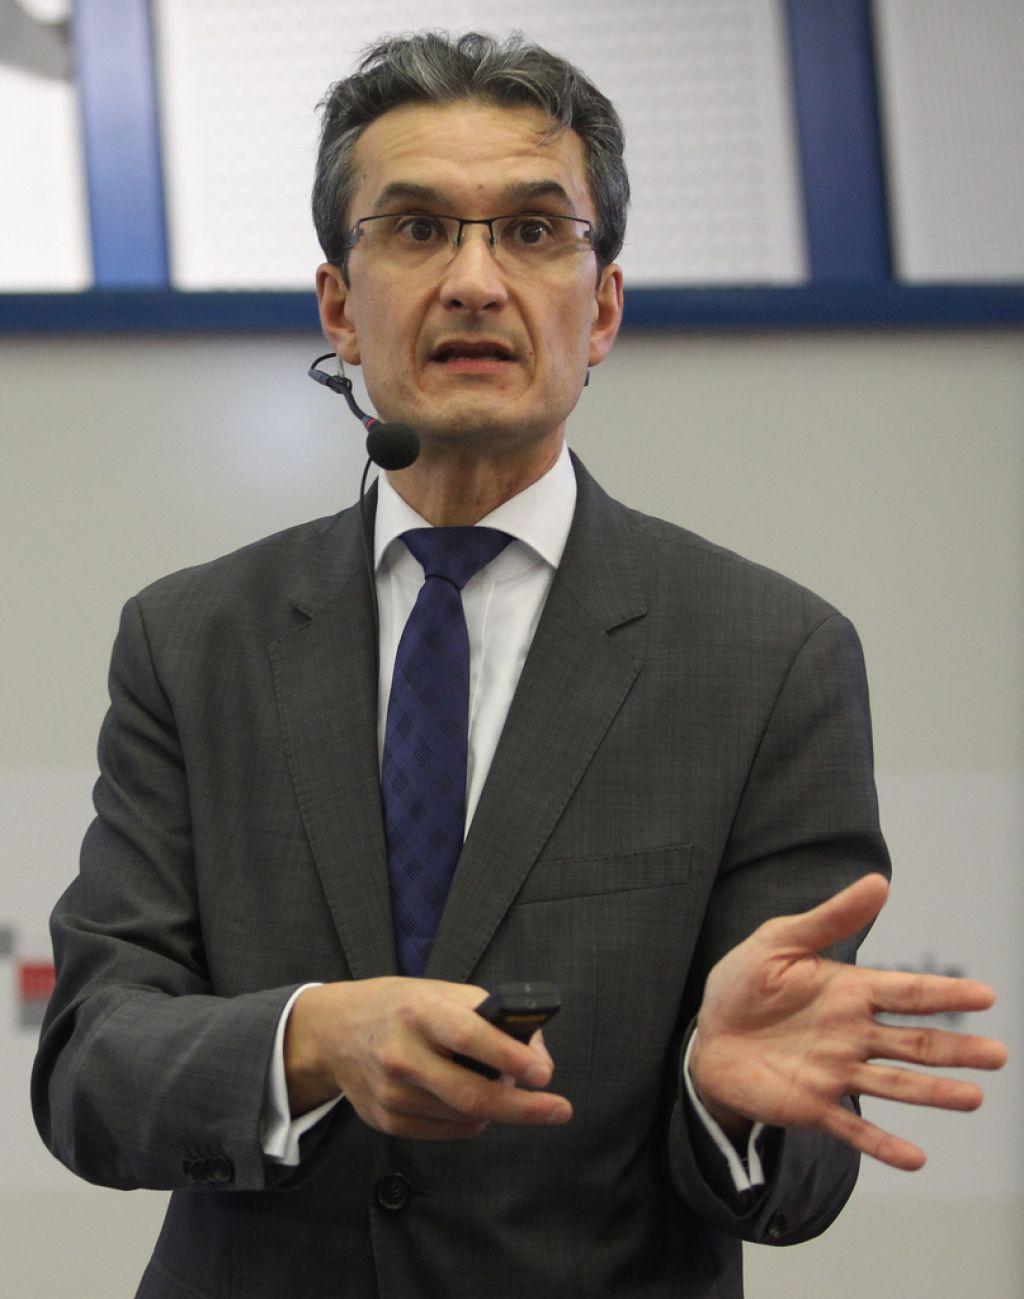 Slovenija za šest mest izboljšala konkurenčnost